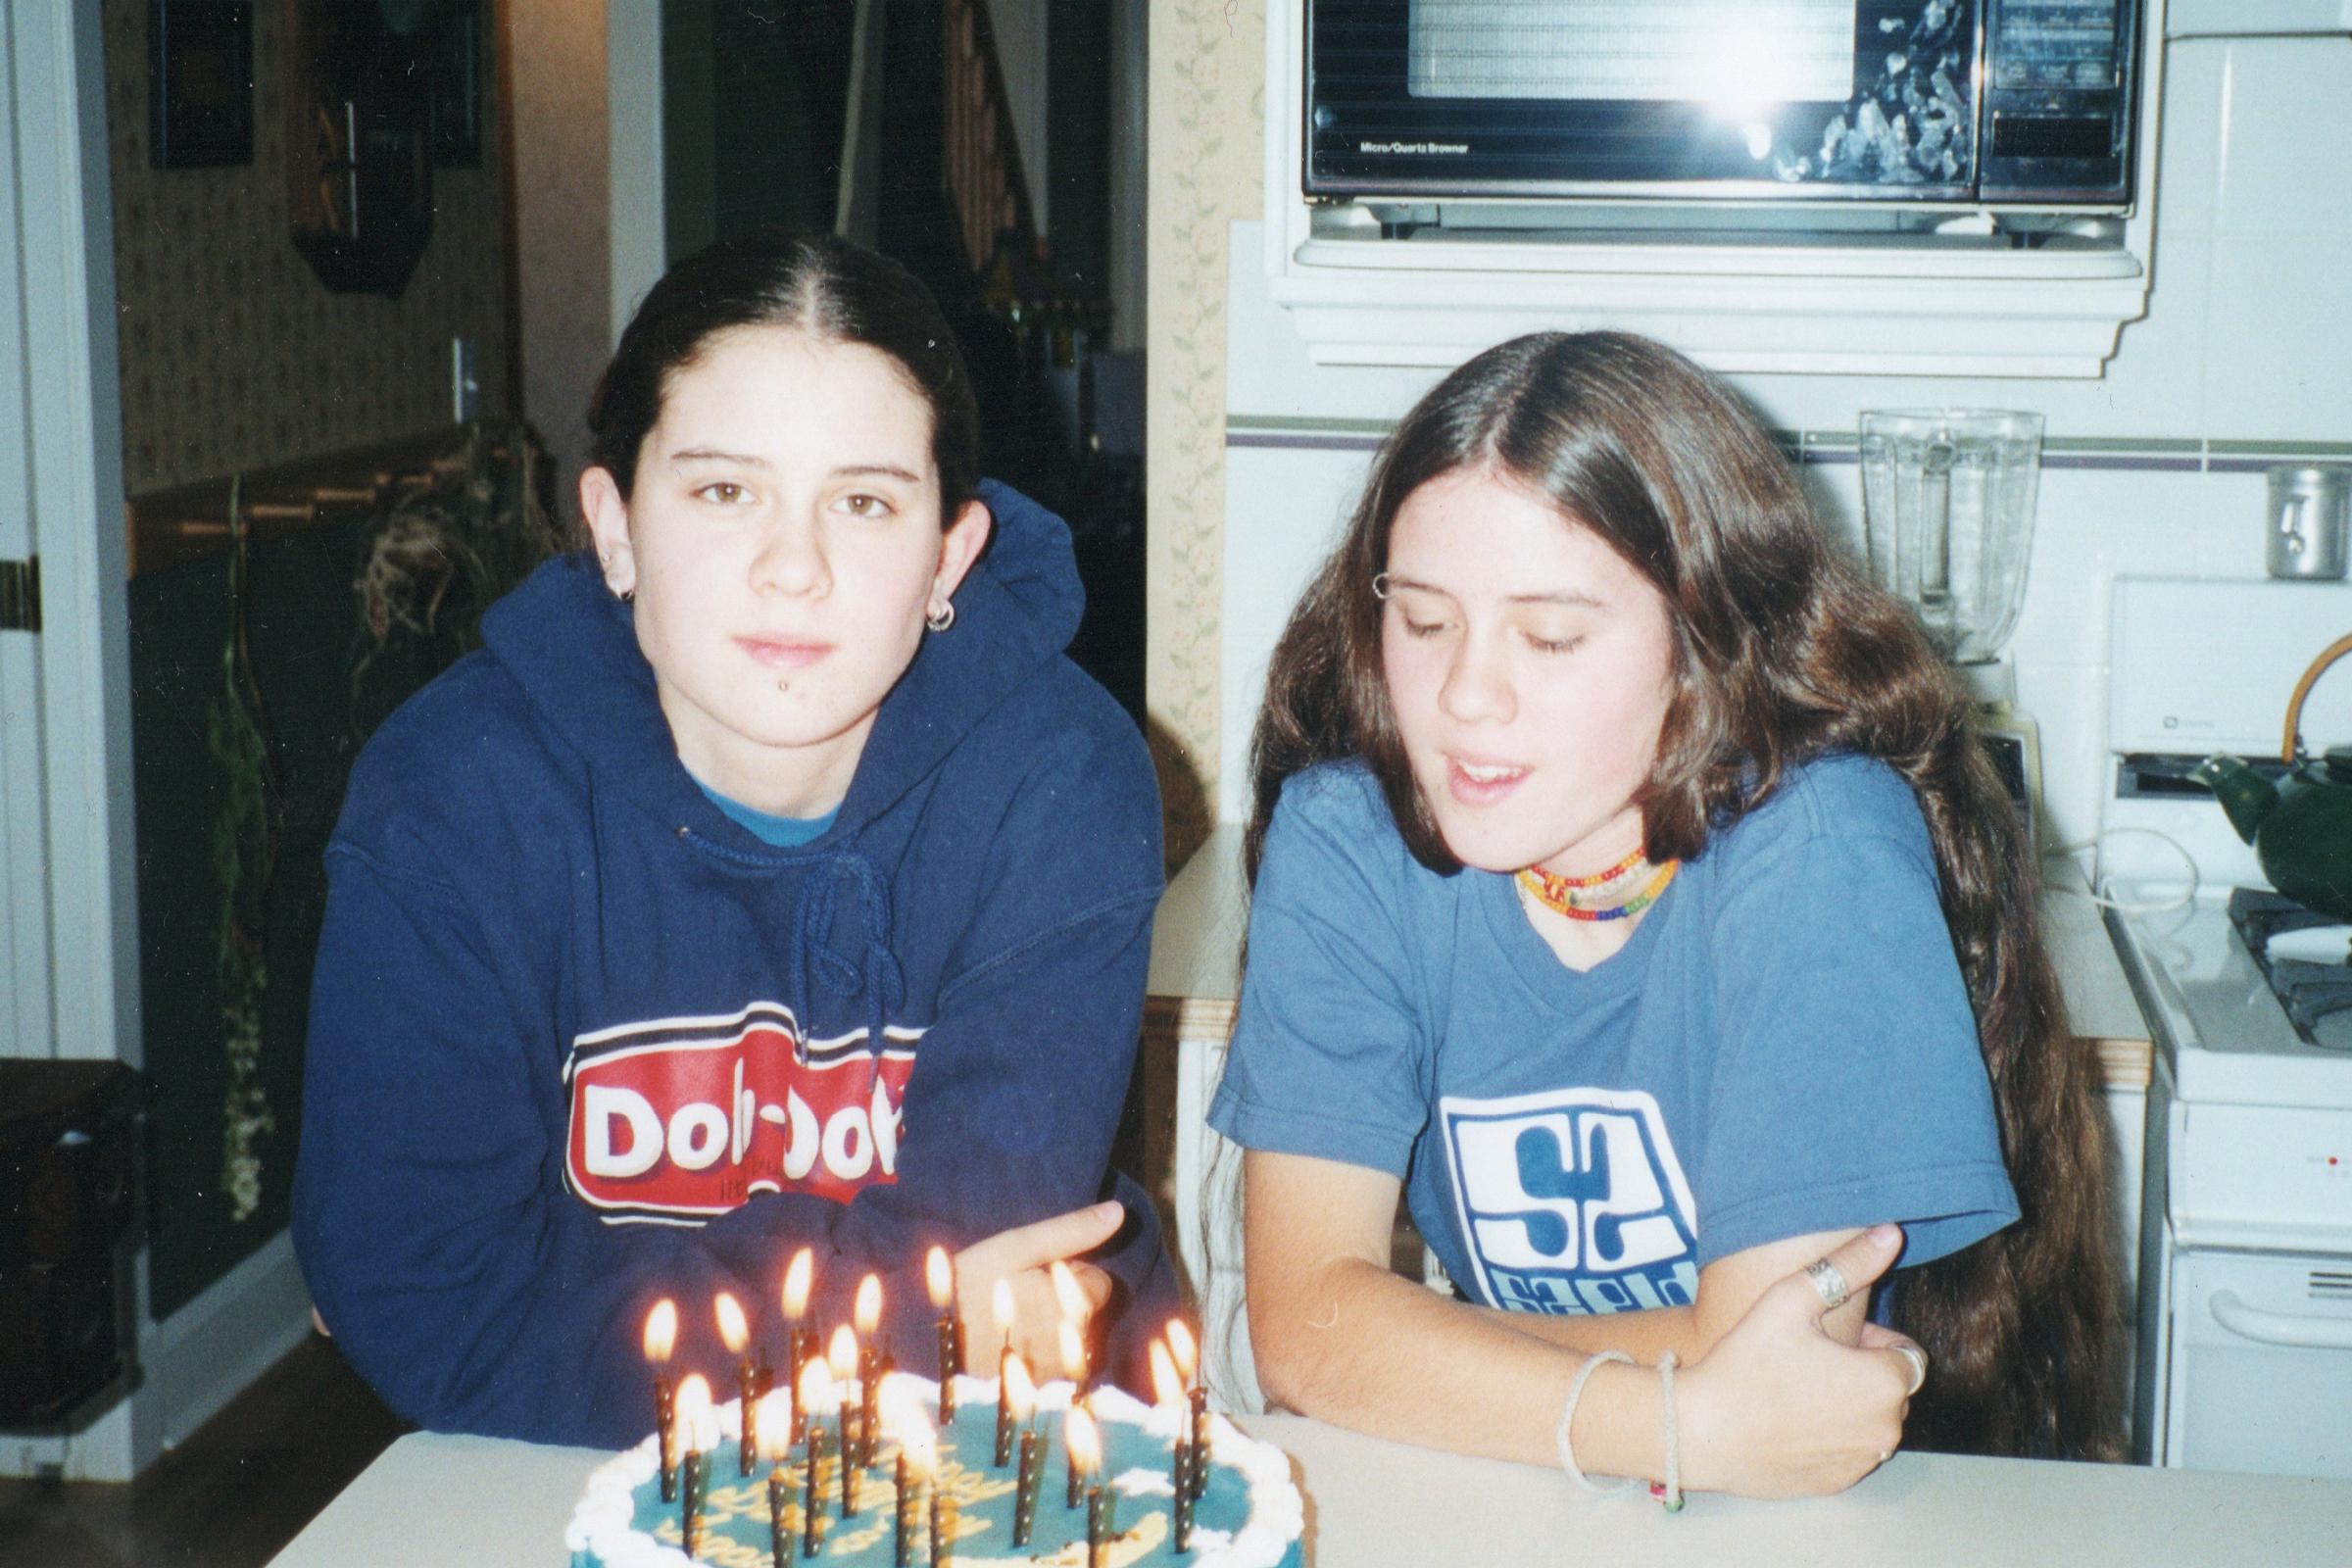 Tegan and Sara's 'High School' Memoir: Inside One of the Duo's Earliest Songs